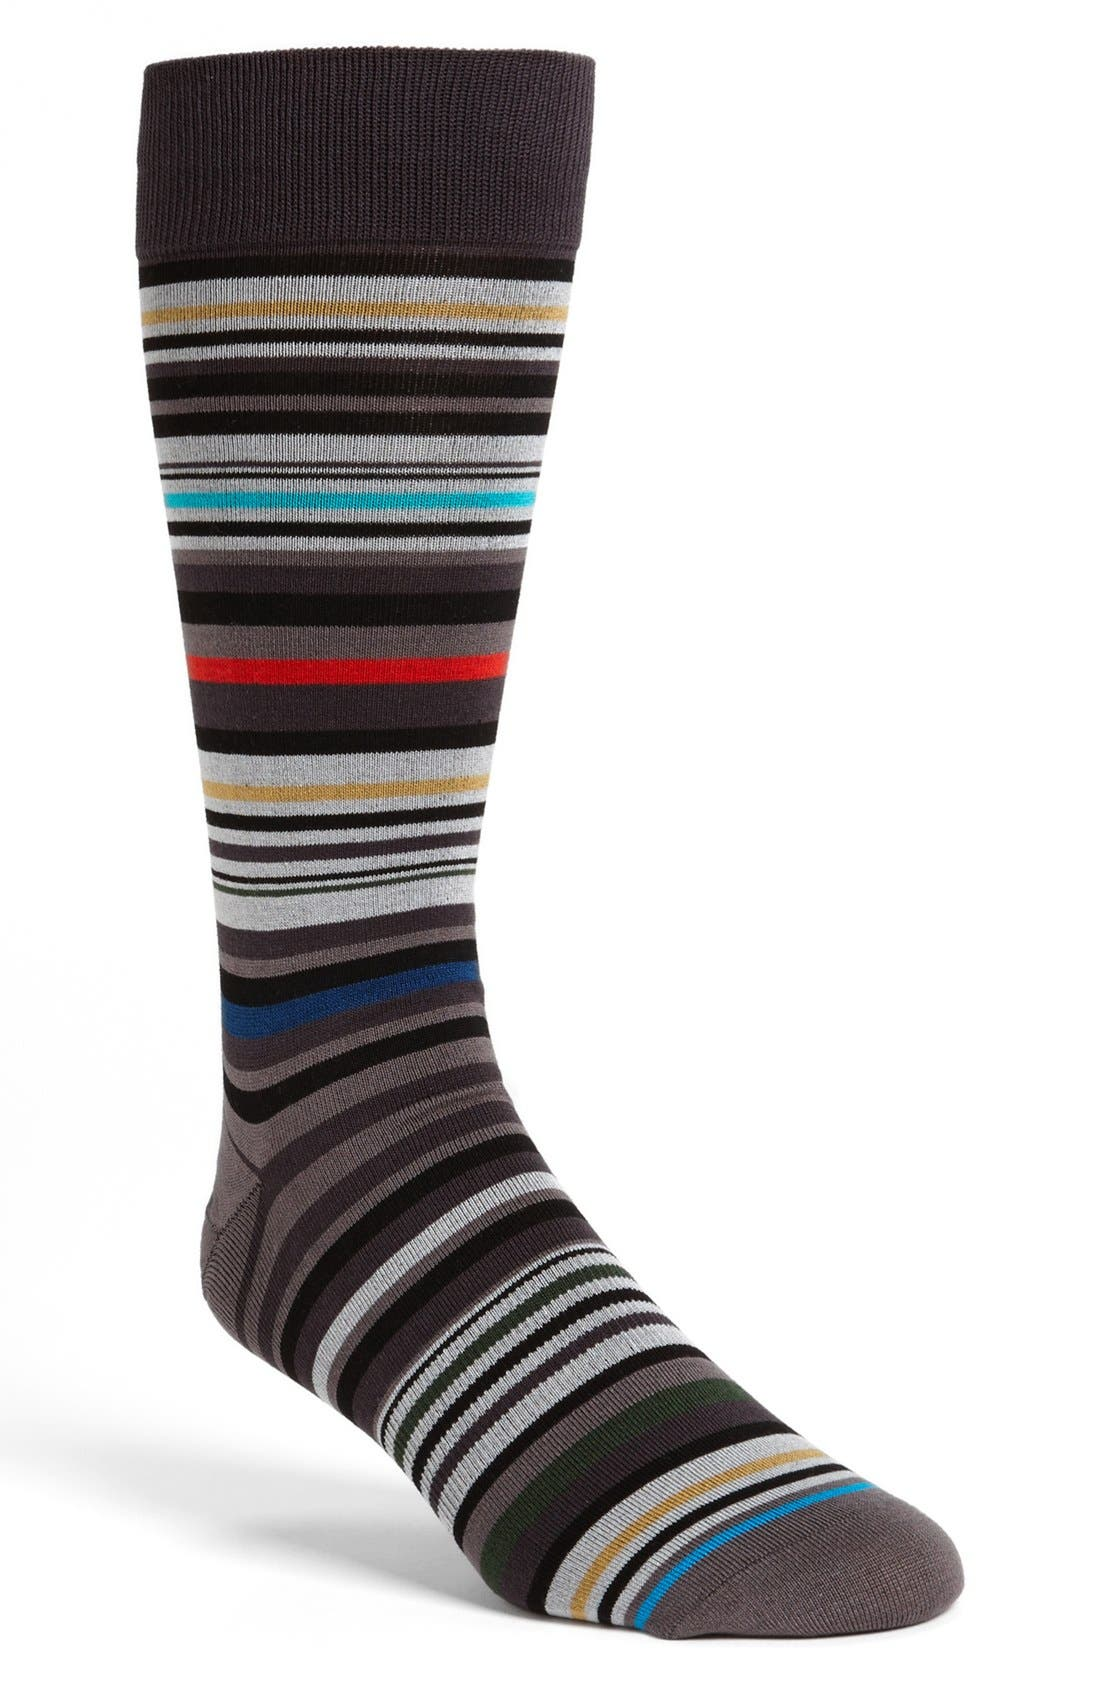 Main Image - Stance 'The Reserve - Hyde' Dress Socks